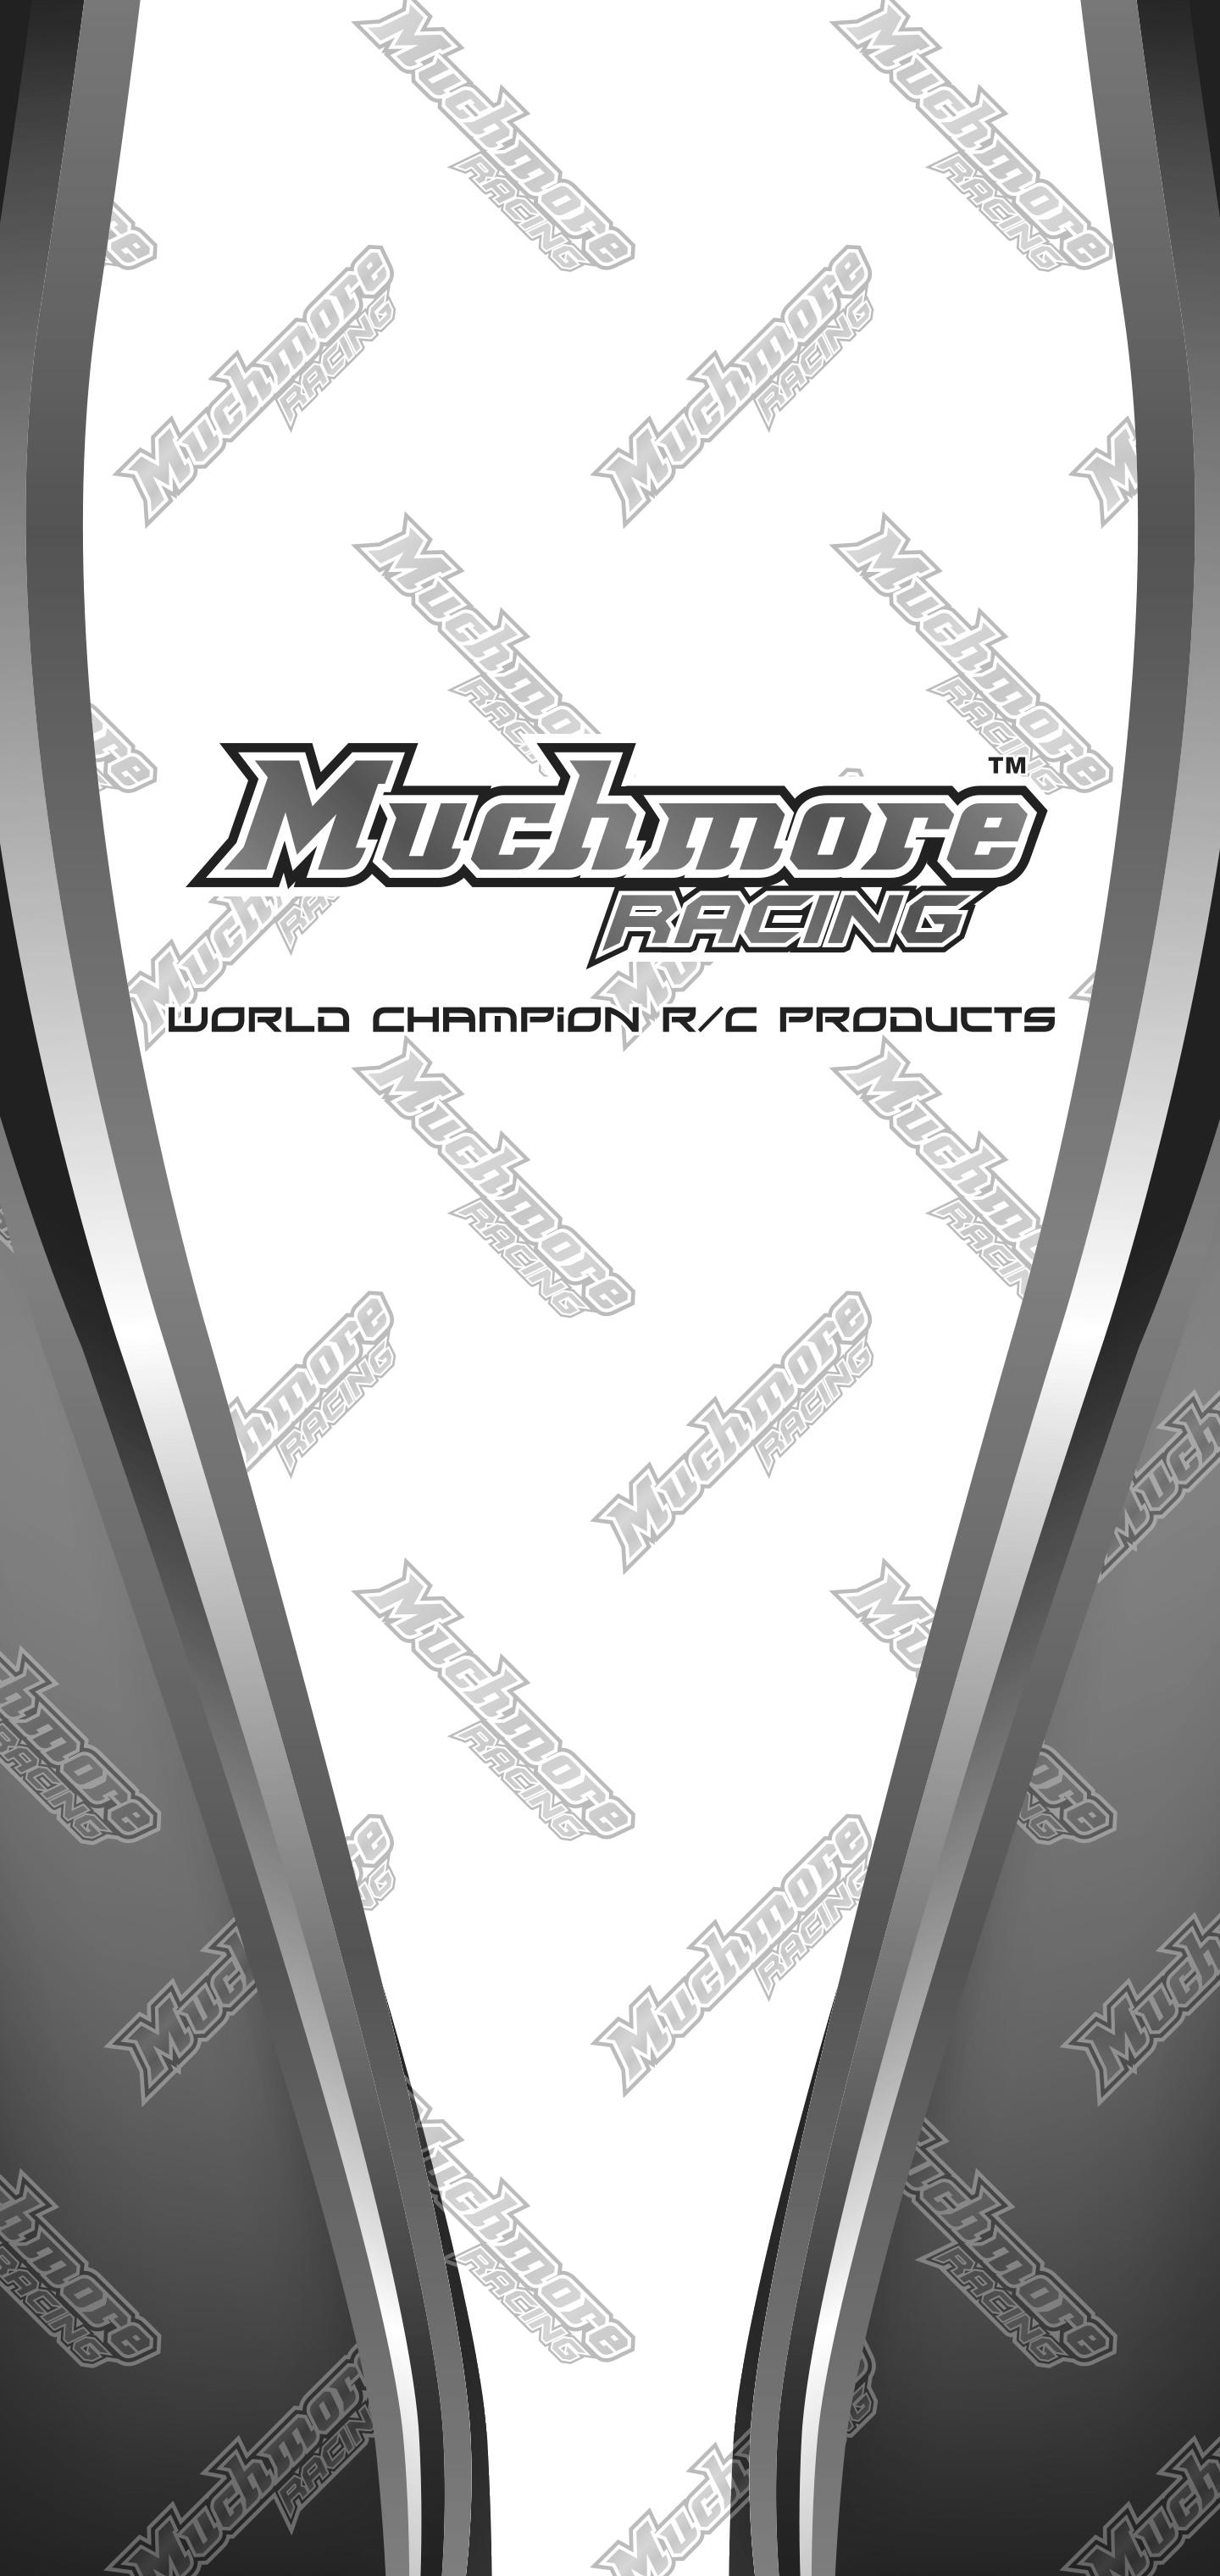 MuchmoreRacing_Wallpaper_Black_Ver_Samsung-Galaxy-19by9-ratio.JPG